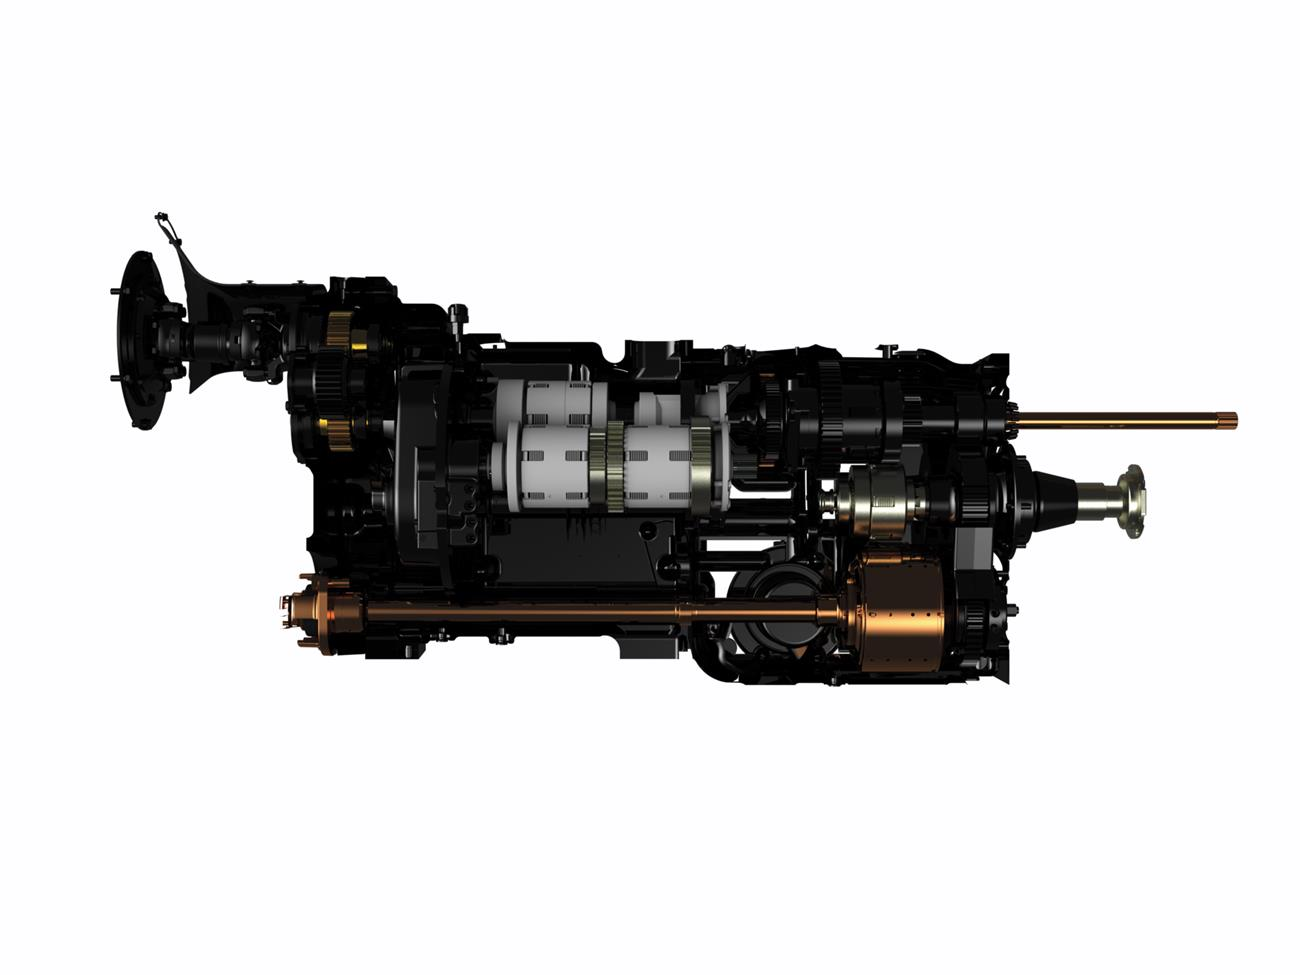 POWERDRIVE Powershift Transmission